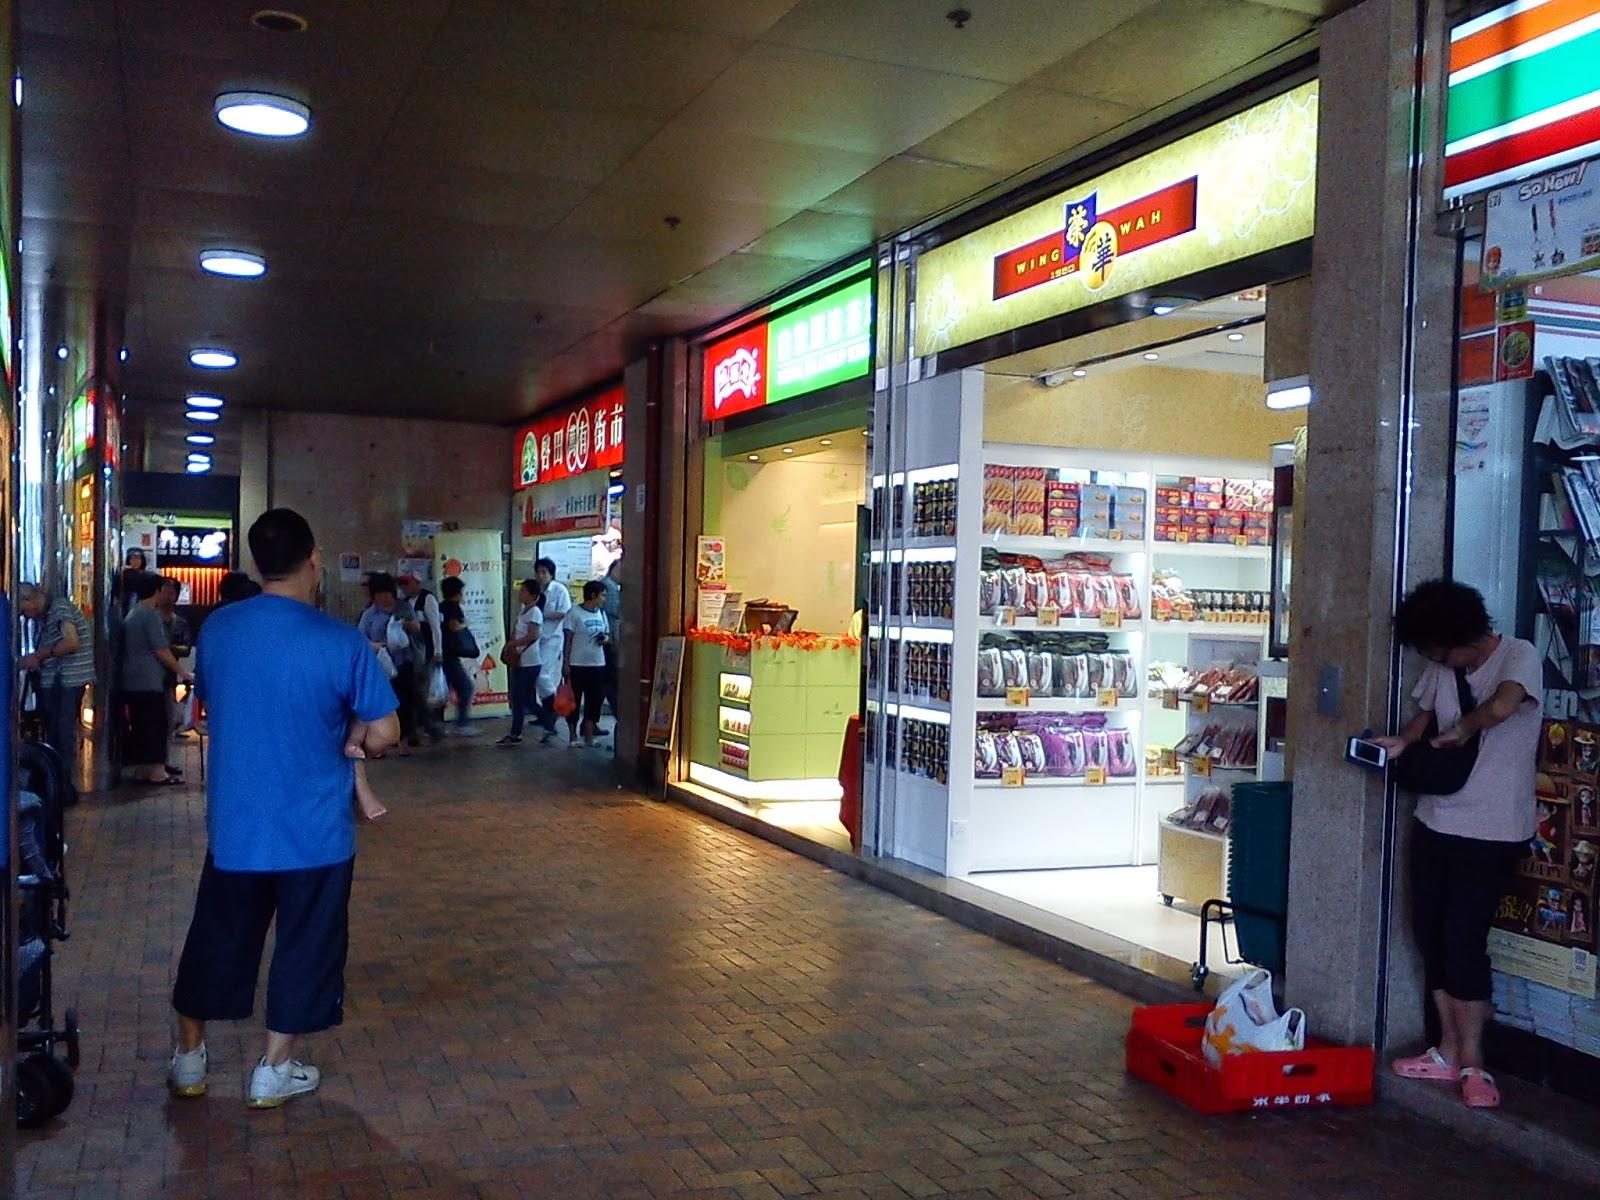 Grassroots O2: 巡視業務.領匯.啟田商場 @2013-10-05